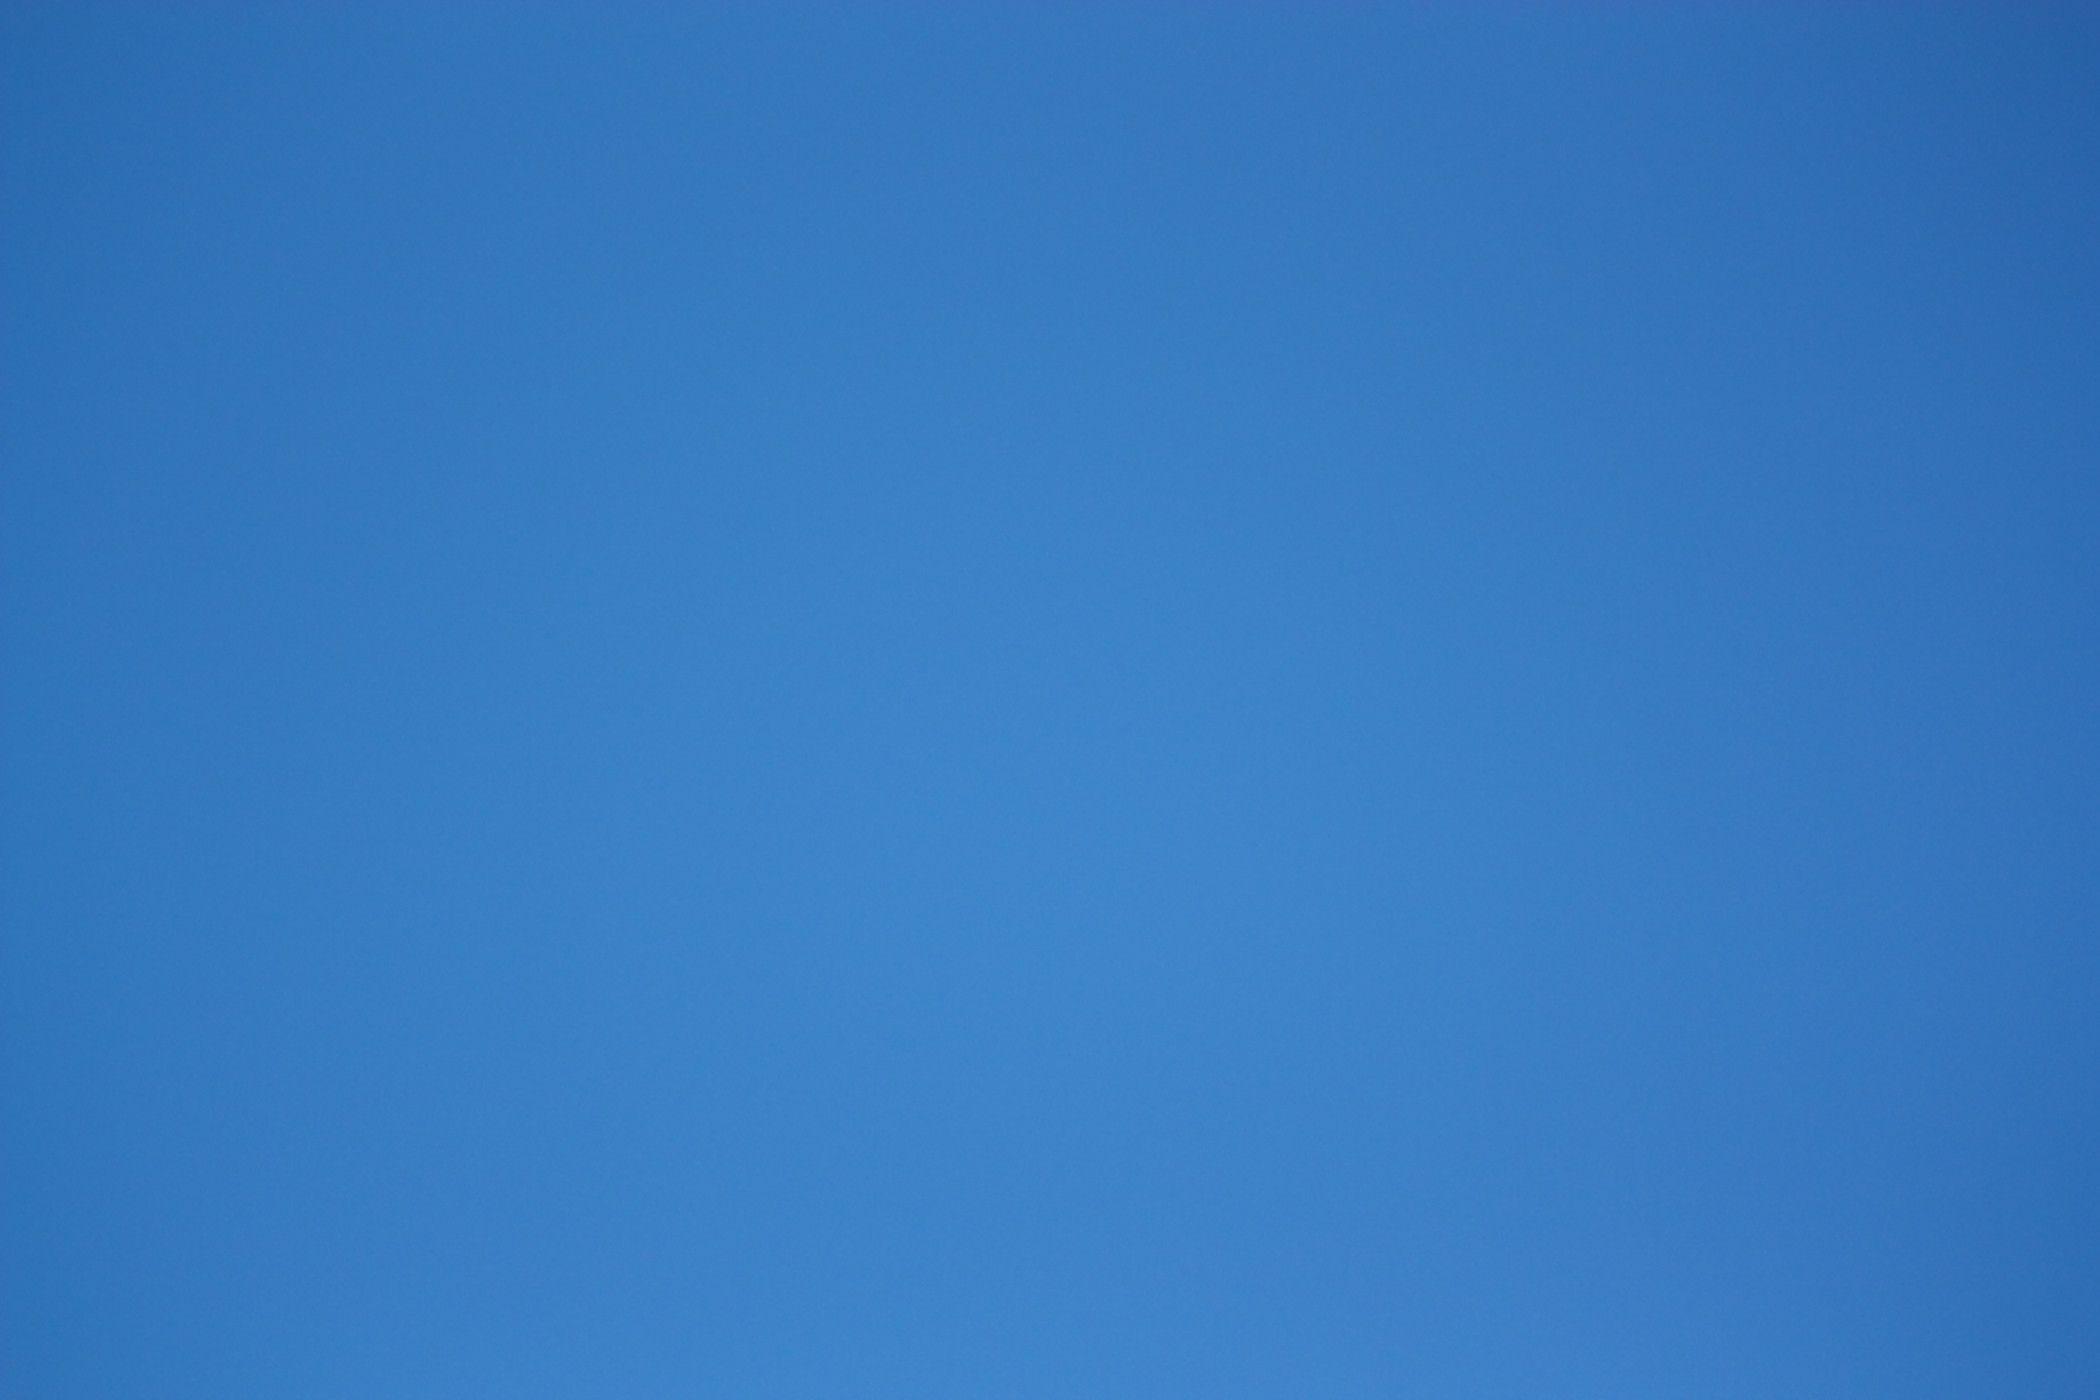 Plain Blue Backgrounds Wallpapers 2100x1400